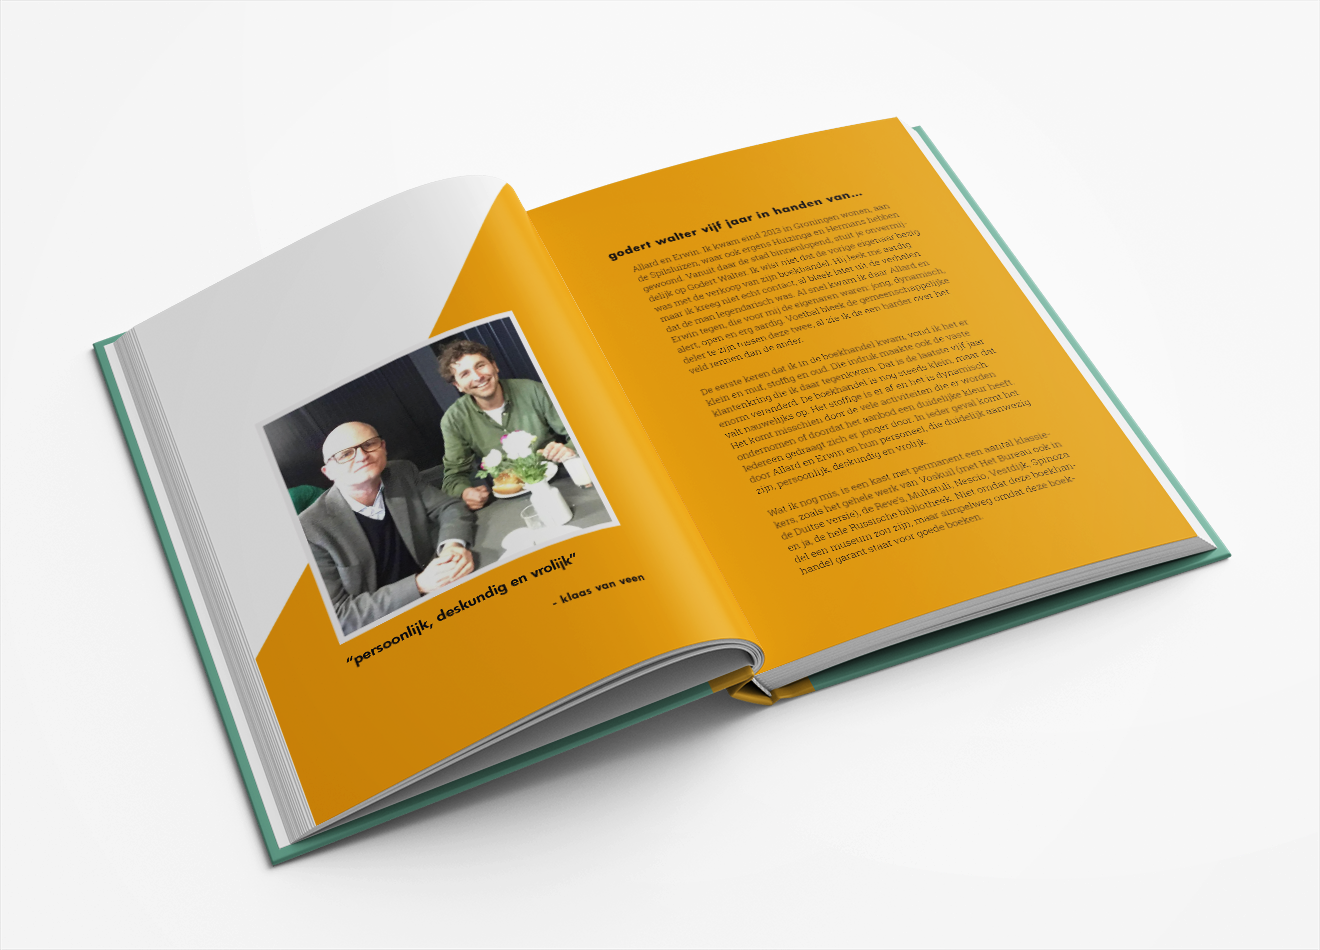 Jubileum boek Godert Walter Vera Post